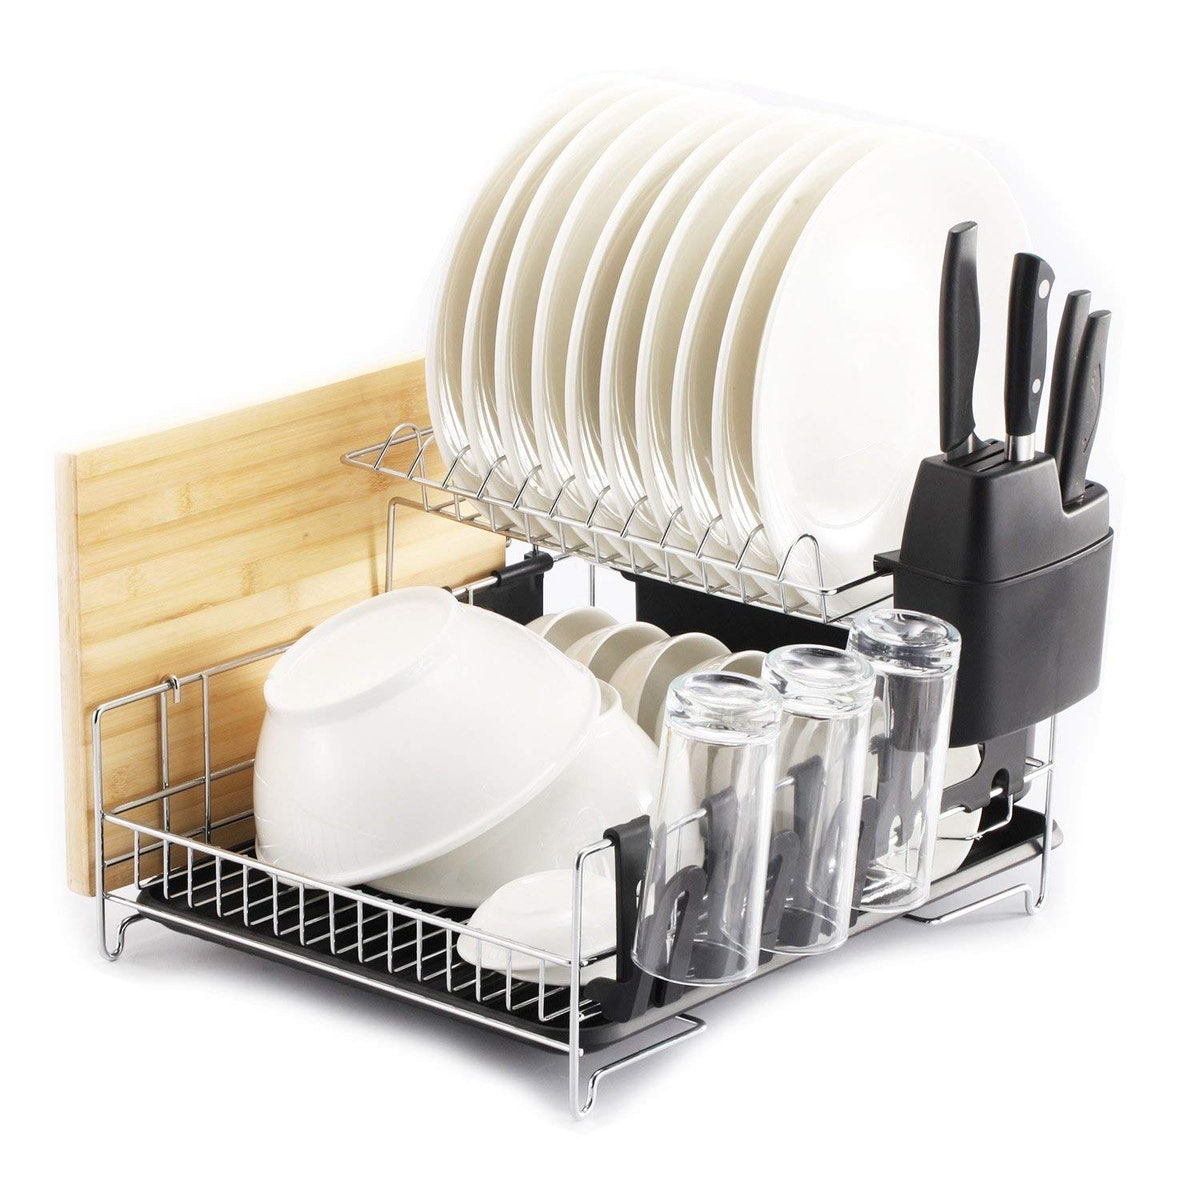 PremiumRacks Customizable Dish Rack